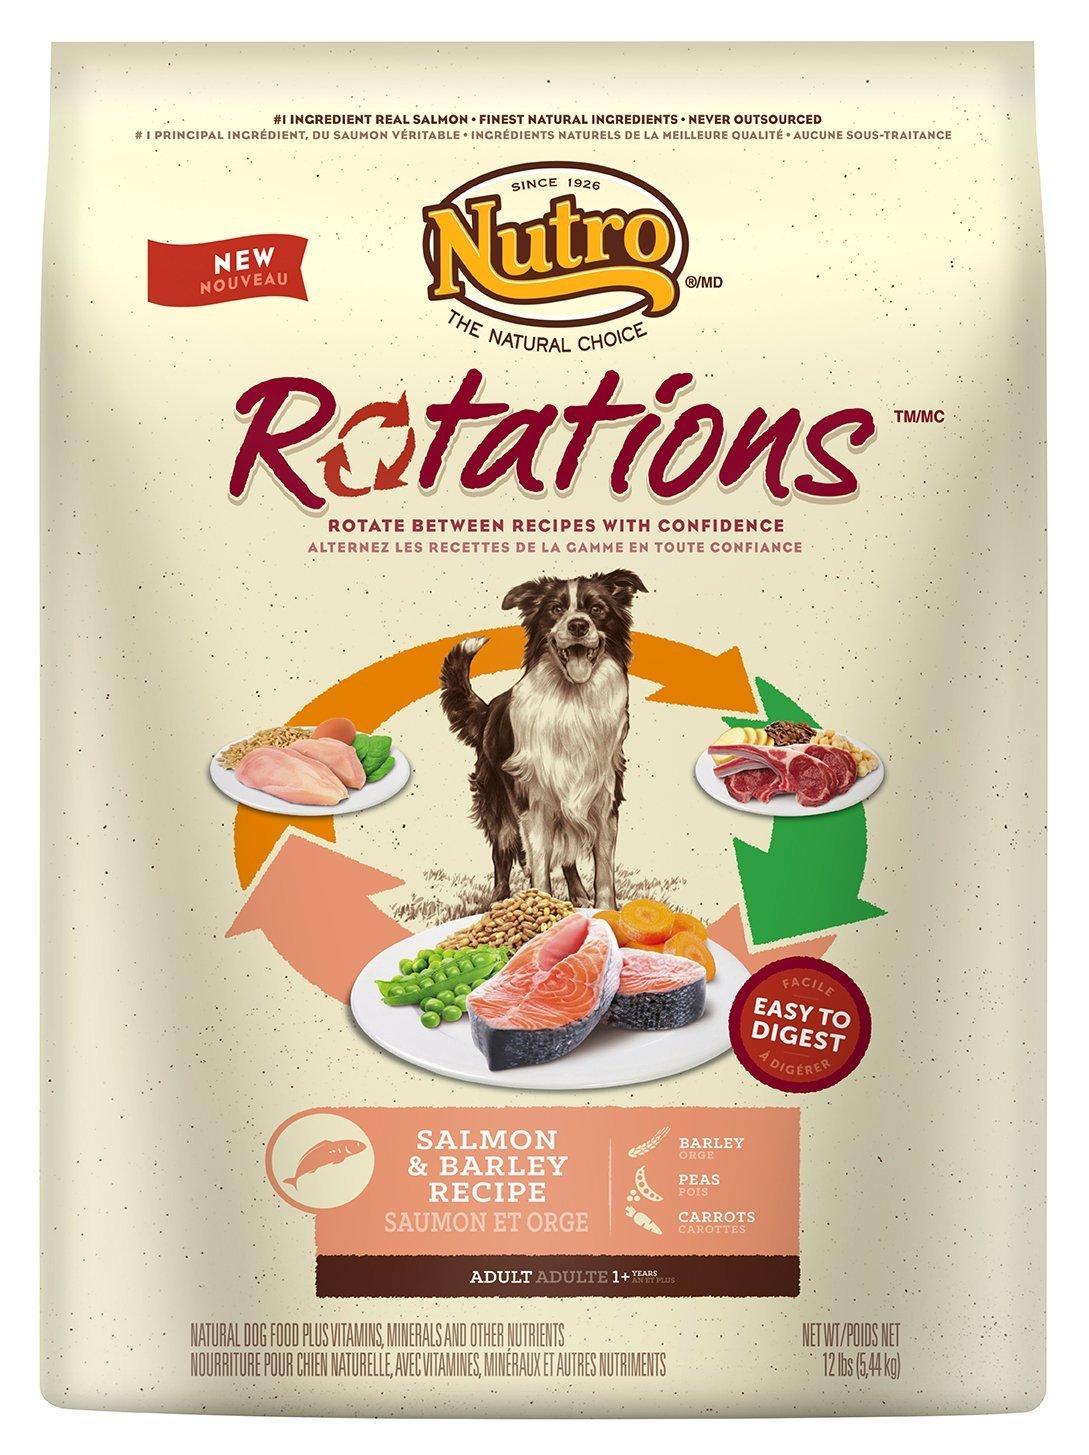 Dog Food Deals from 53c/lb: Eukanuba, Nutro, Paula Deen, Nutro Rotations Salmon $7.50 for 12lbs